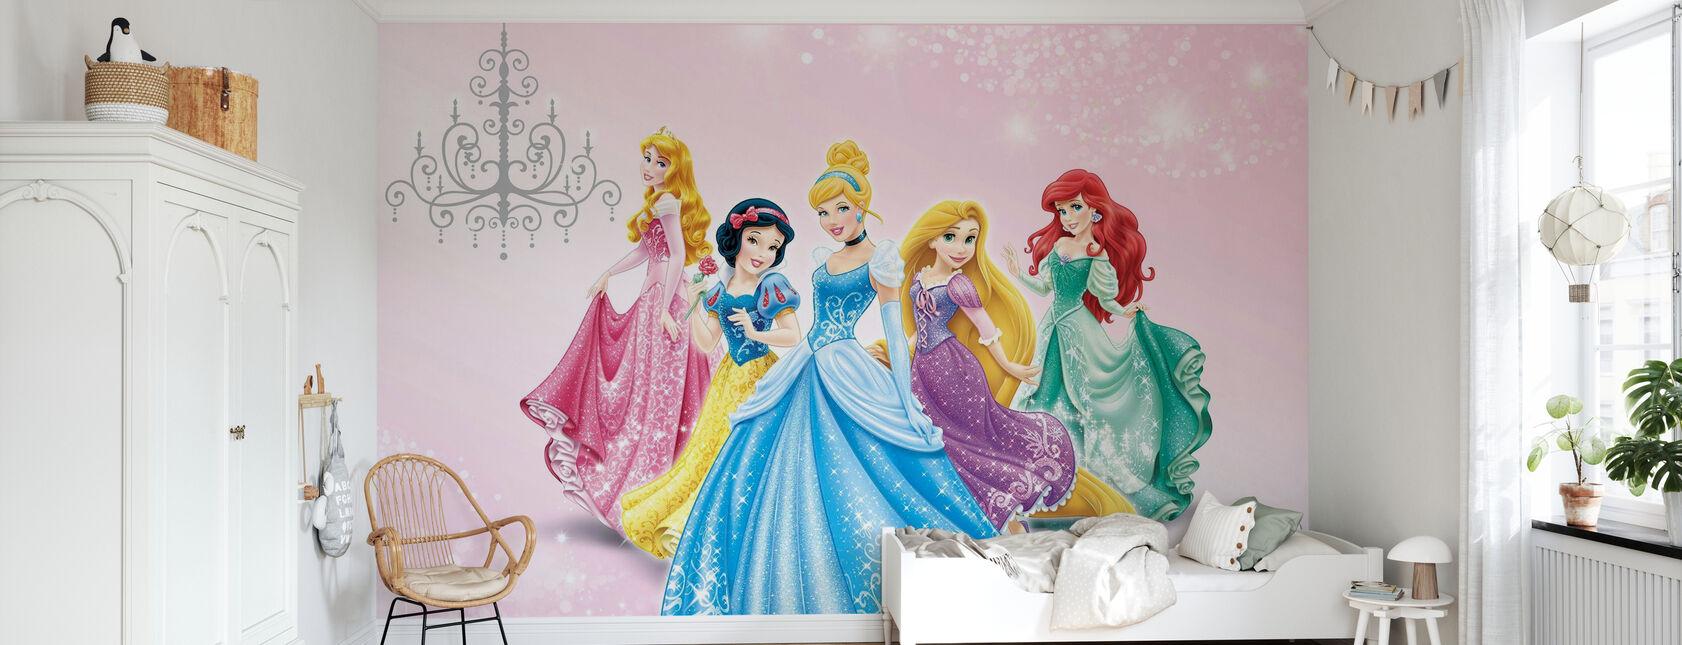 Disney Princess - Rosa - Tapet - Barnrum